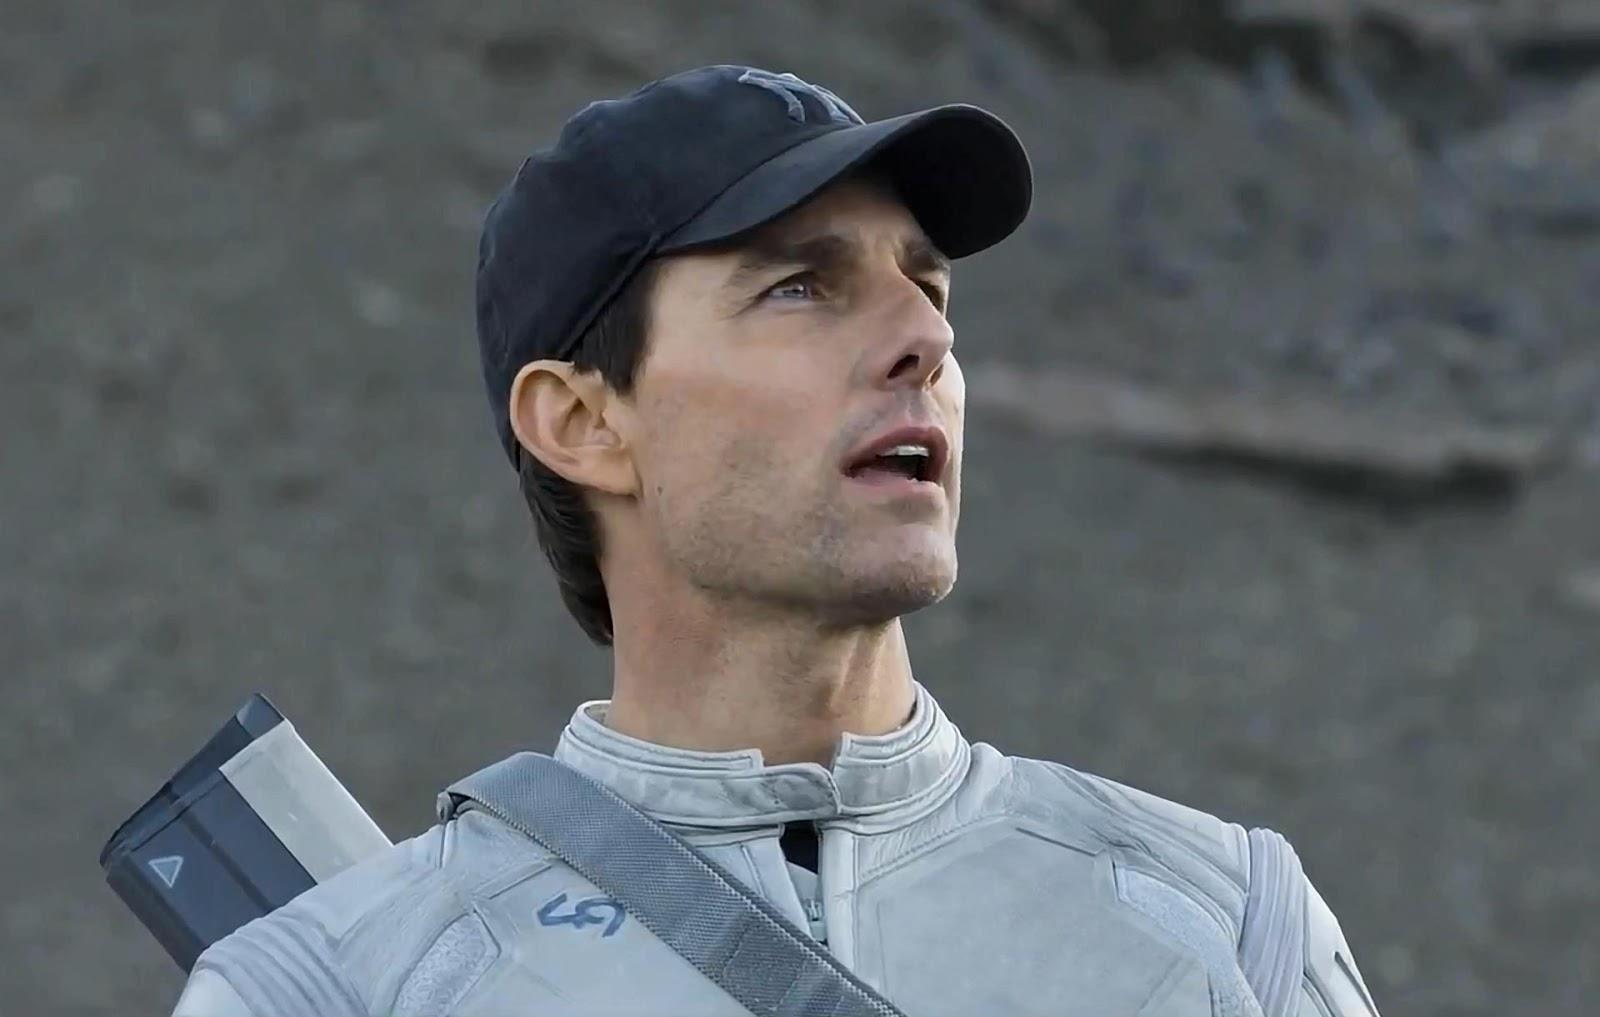 Tom cruise a falon maszik 338 - Tom Cruise And Tron Legacy Director Joseph Kosinski Teamed Up For Oblivion